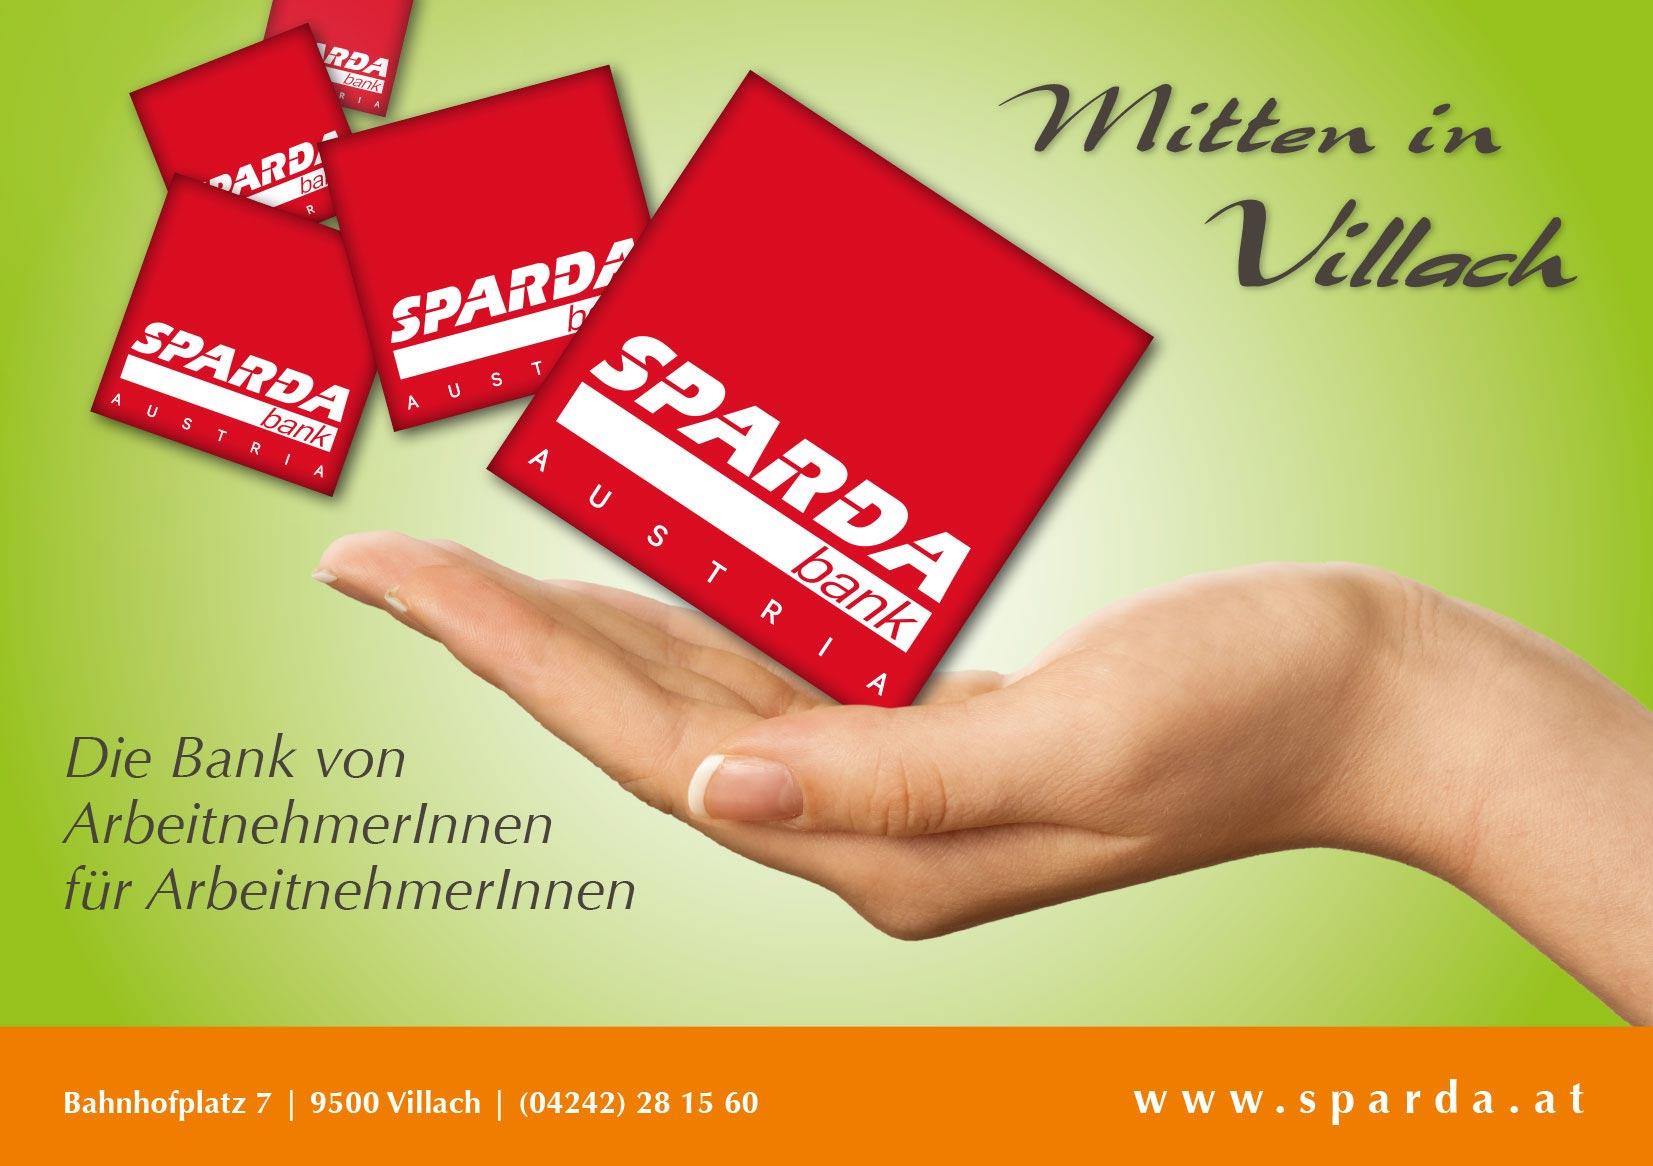 Sparda Bank Werbekampagne